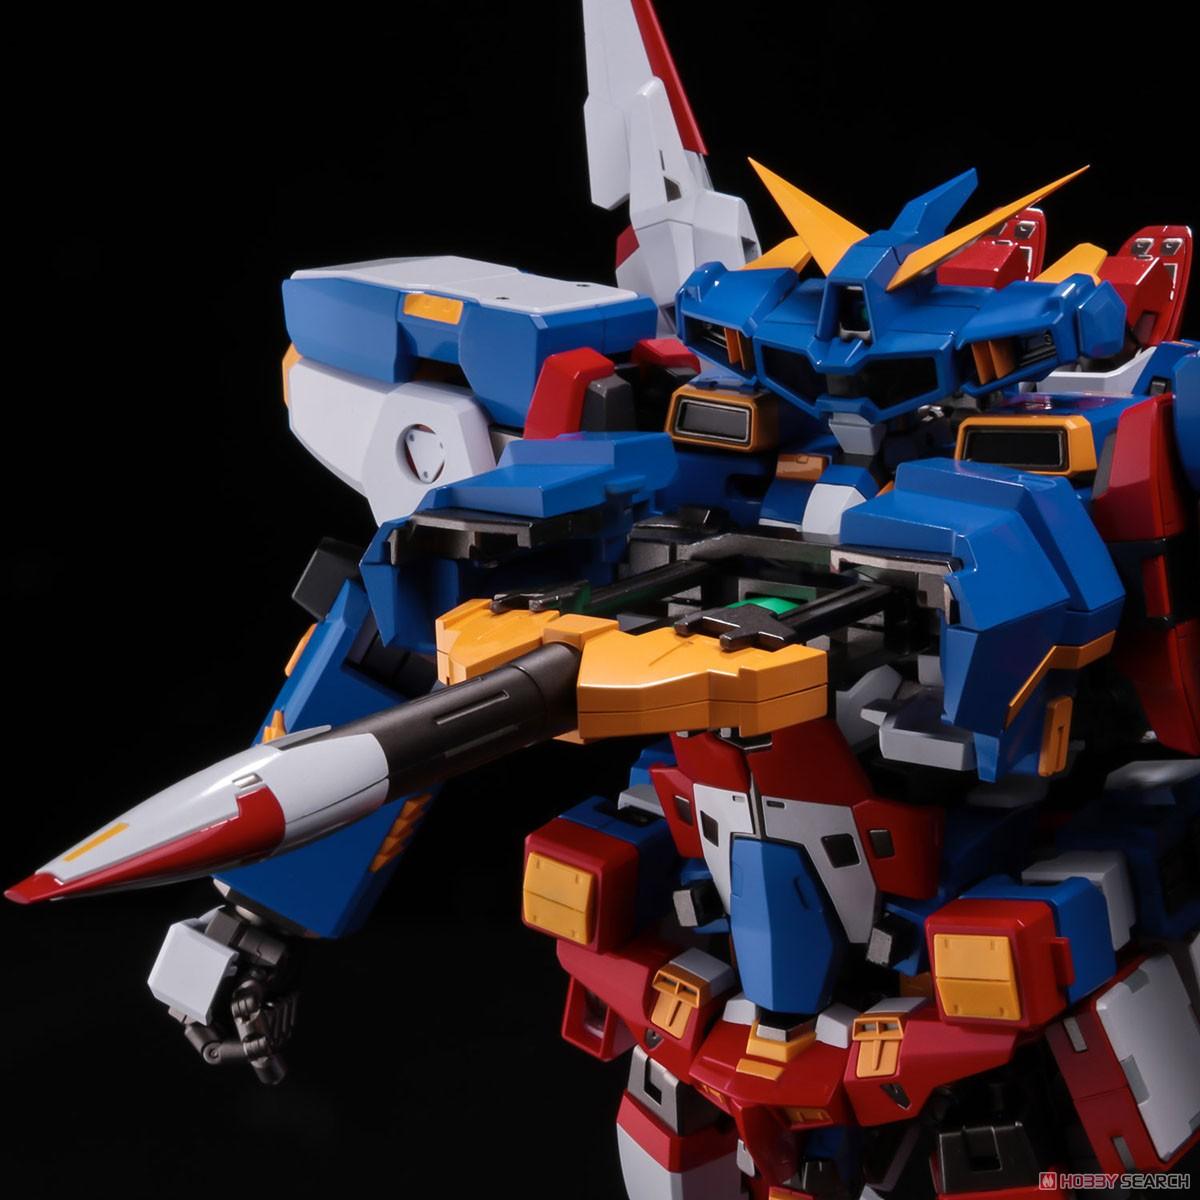 RIOBOT『変形合体 R-1』スーパーロボット大戦OG 可変合体フィギュア-048